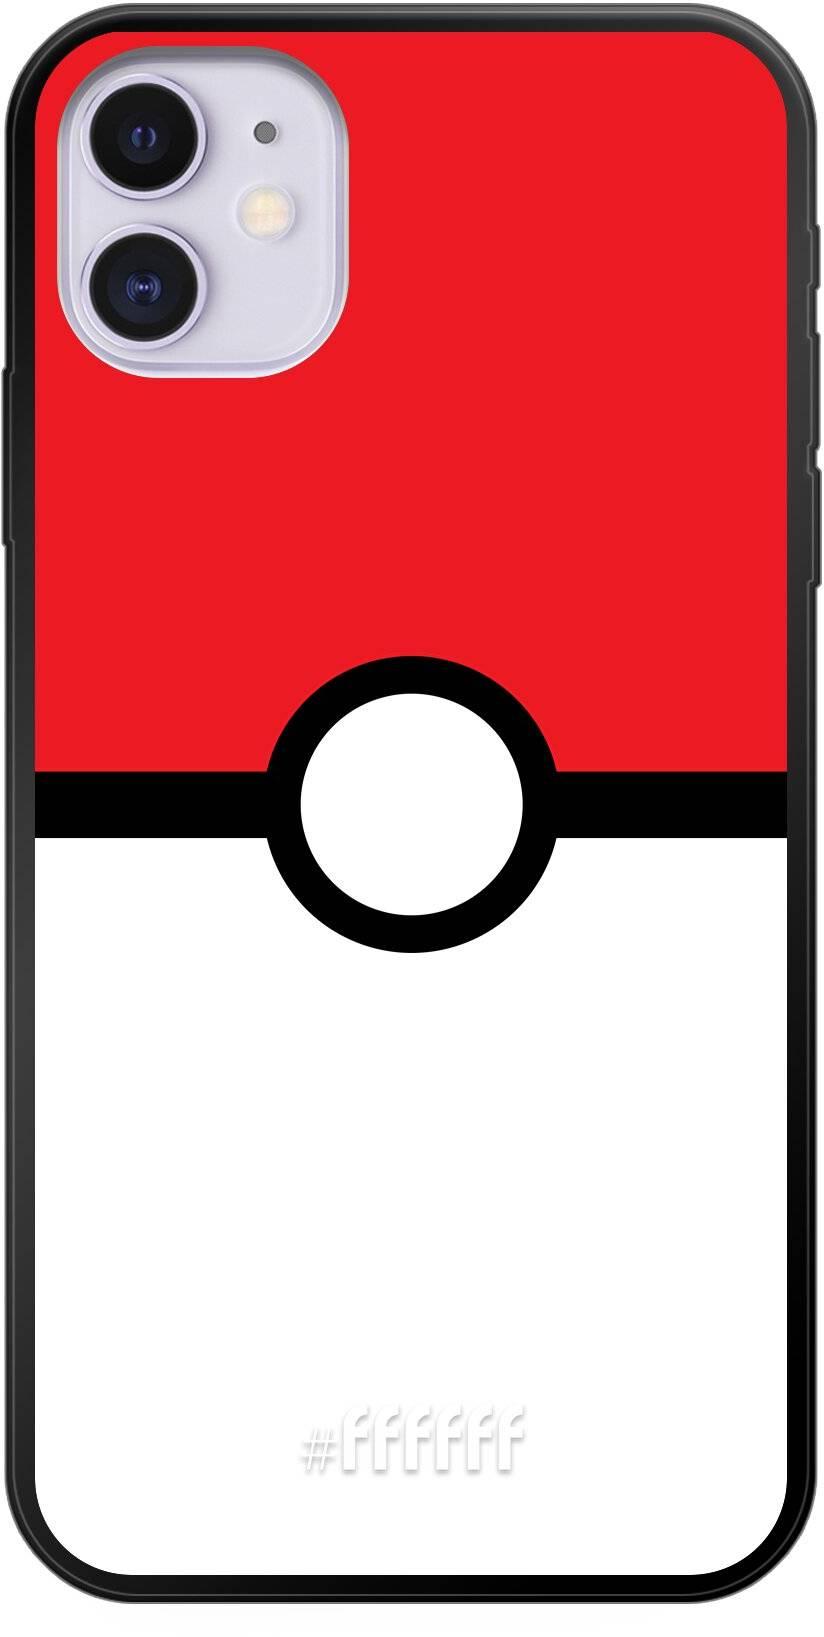 Pokeball iPhone 11